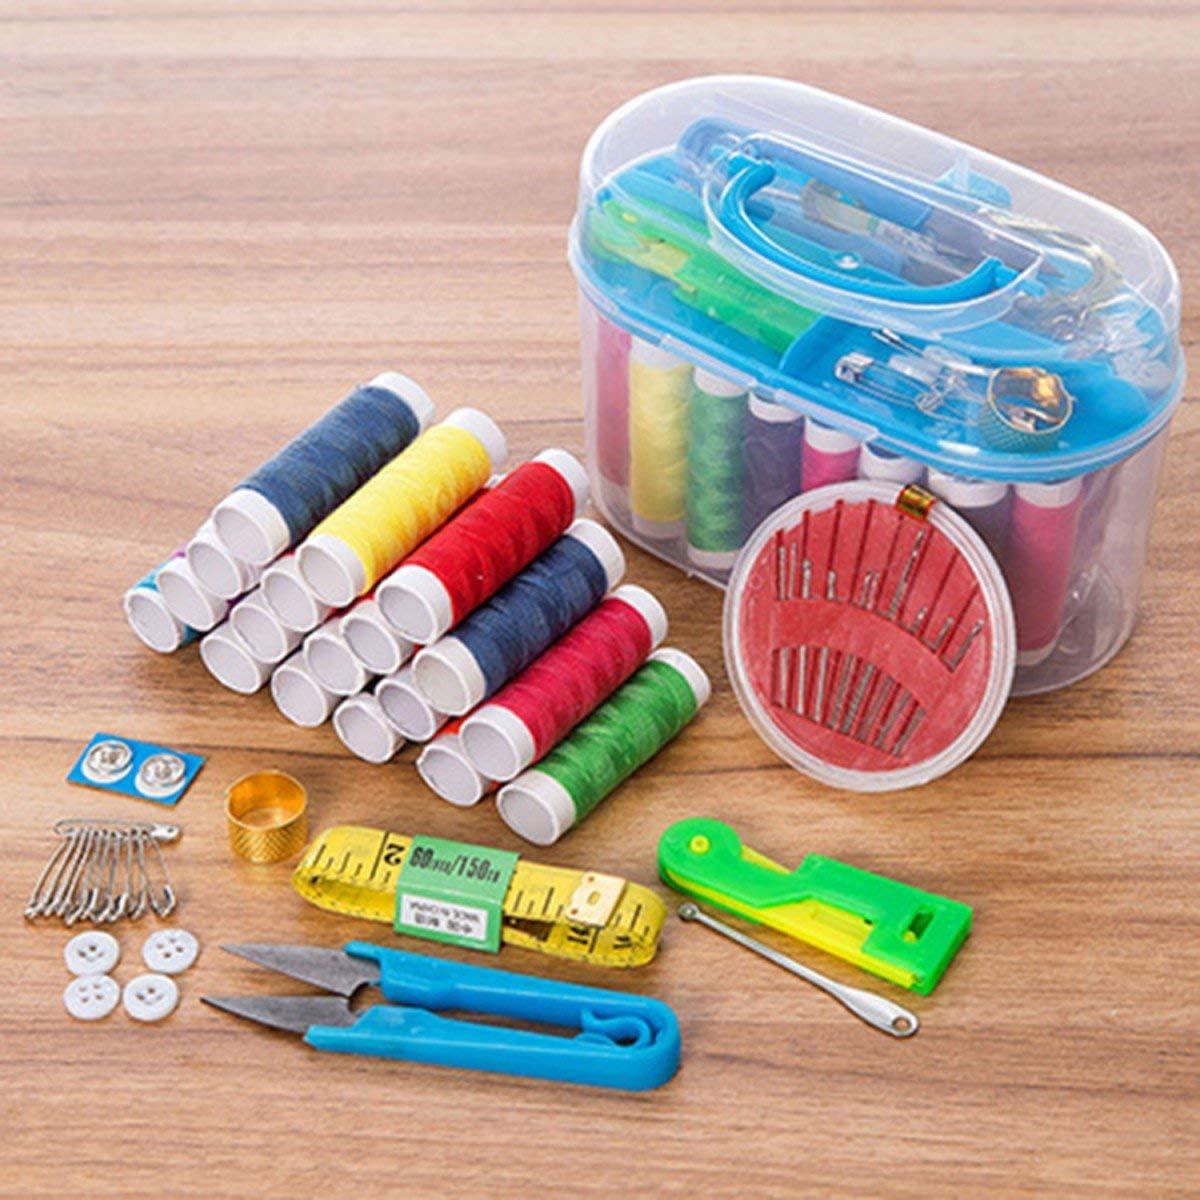 Greatangle-UK Sewing box set of 10 Practical home sewing box Universal portable finishing sewing kit